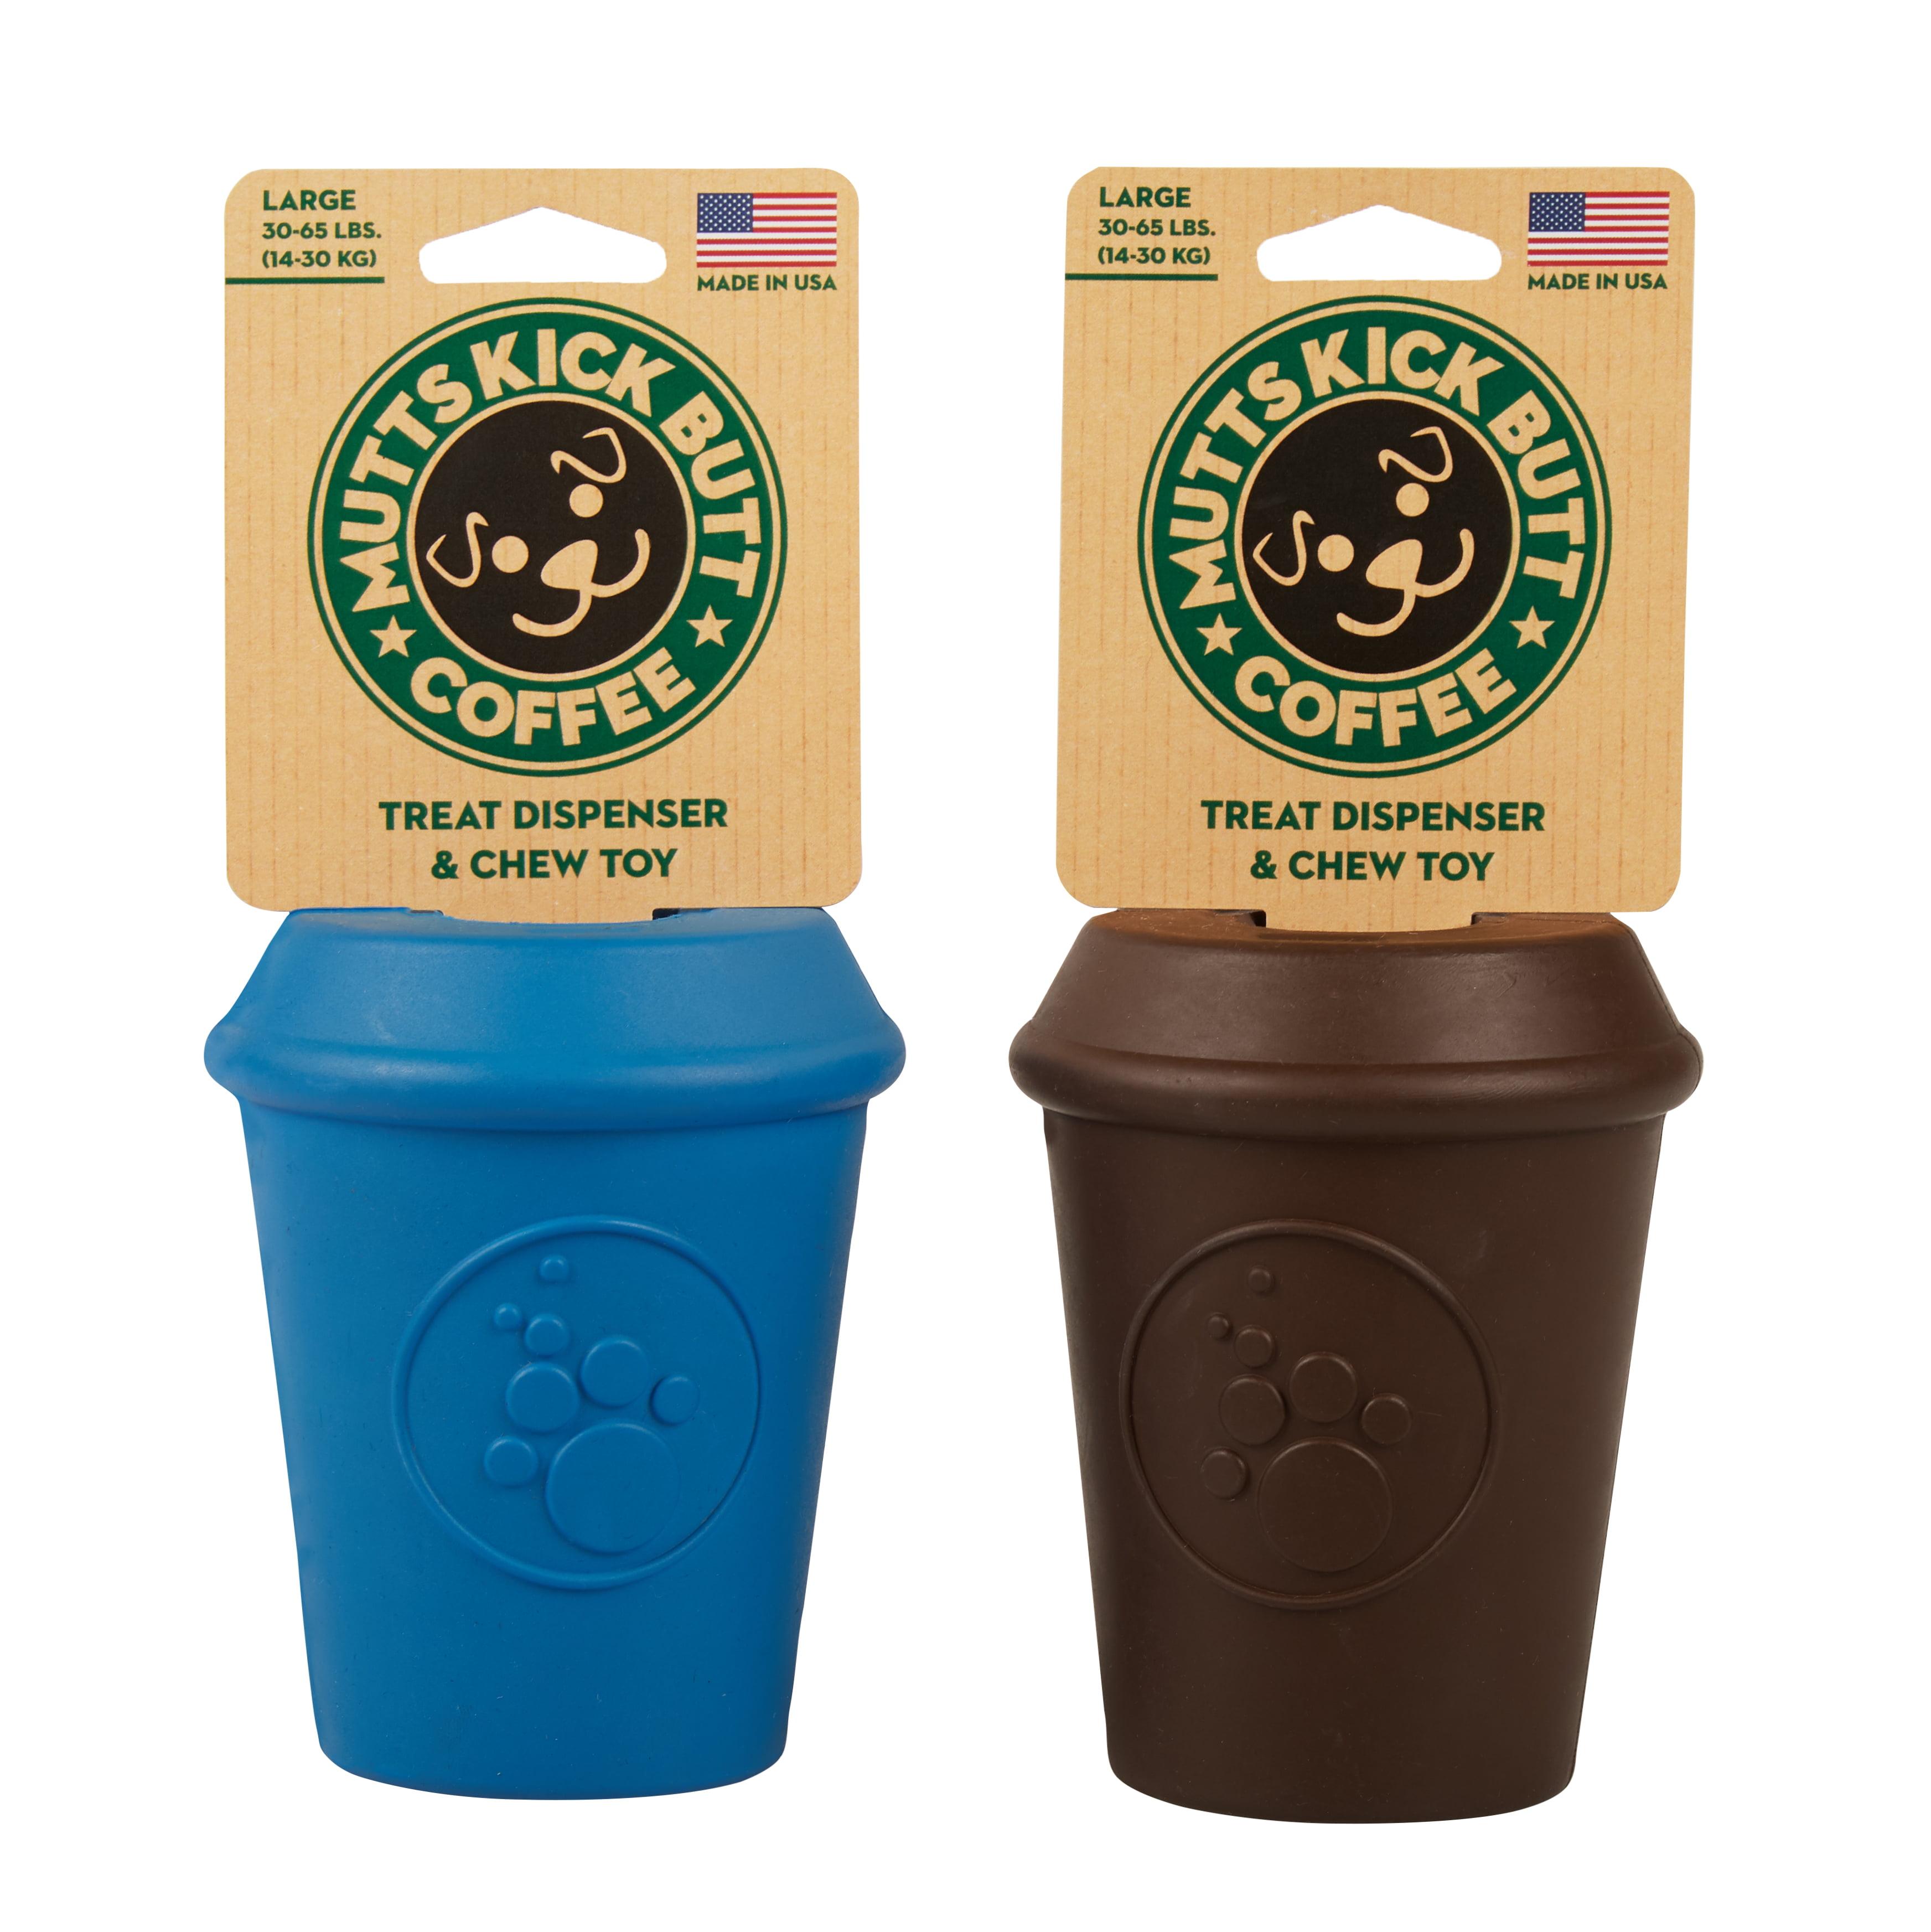 MKB Coffee Cup Treat Dispenser Dog Toy L